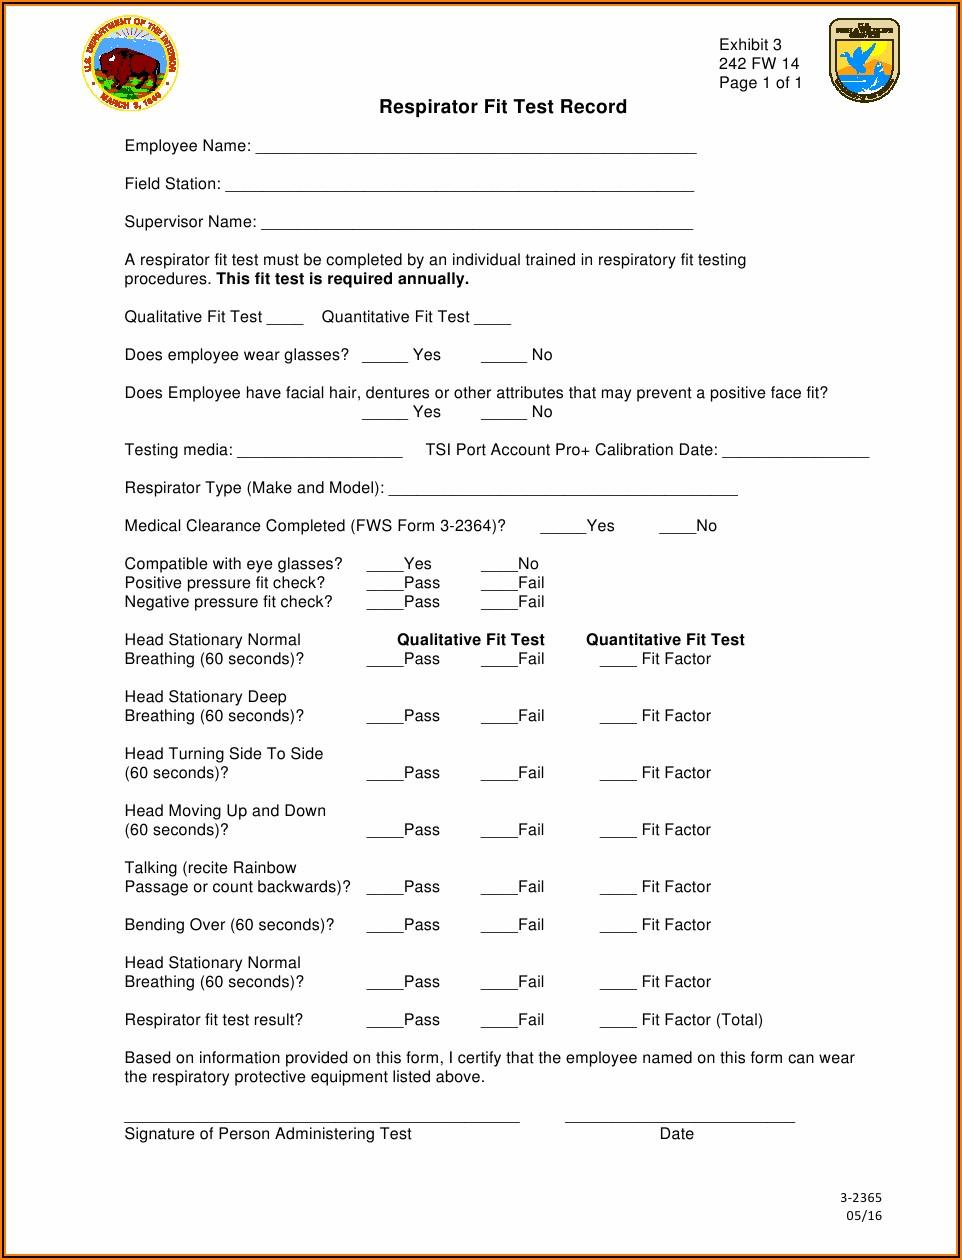 N95 Qualitative Fit Test Form